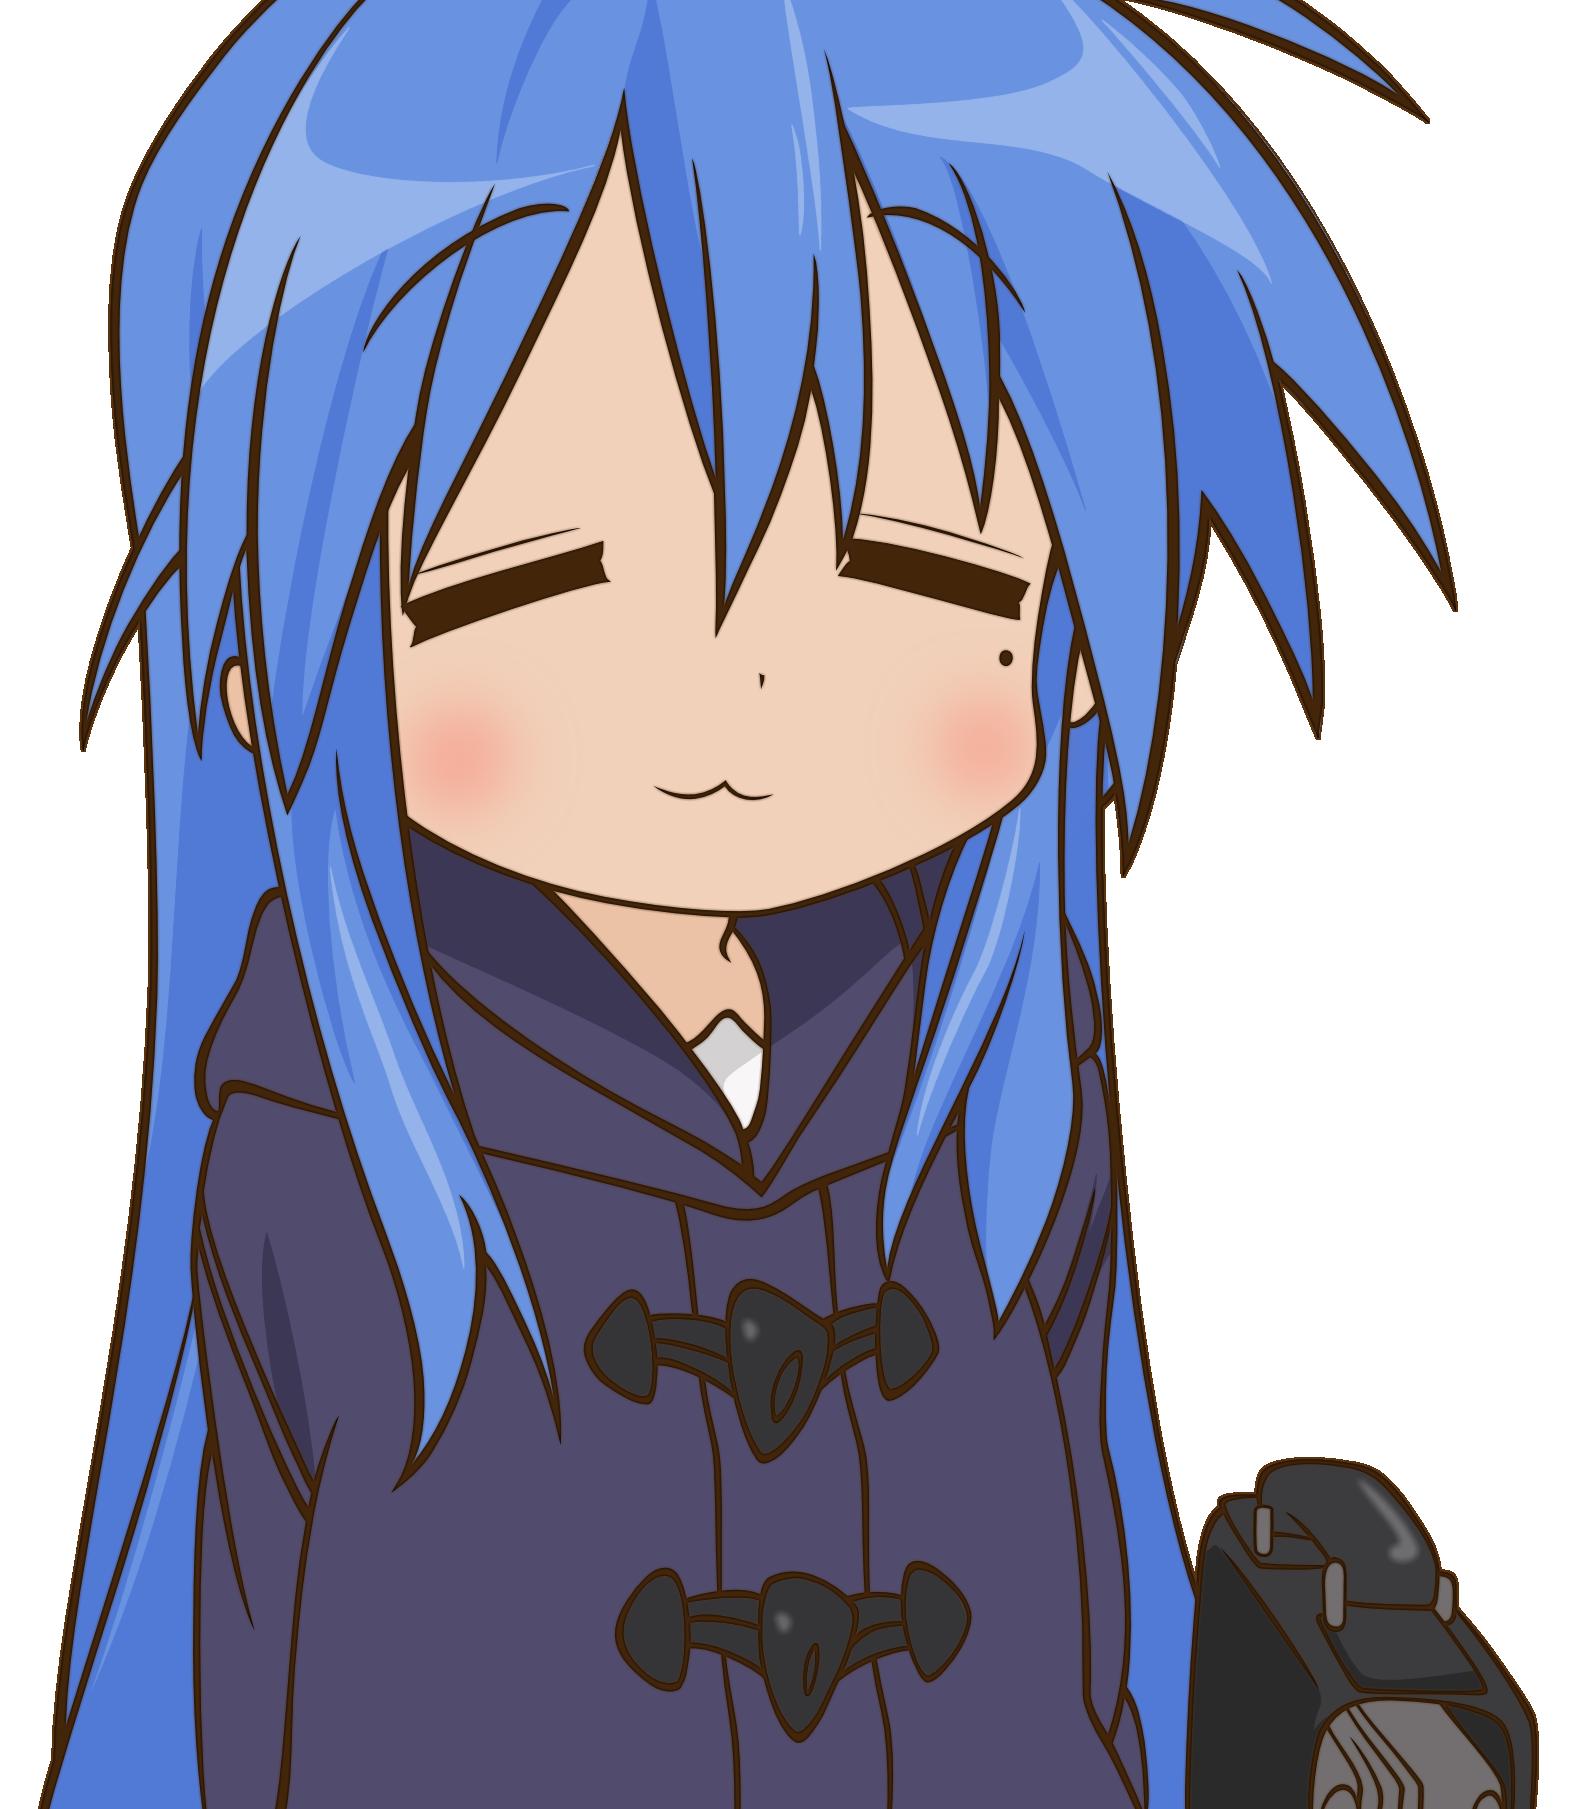 Картинки на аву с стиме аниме